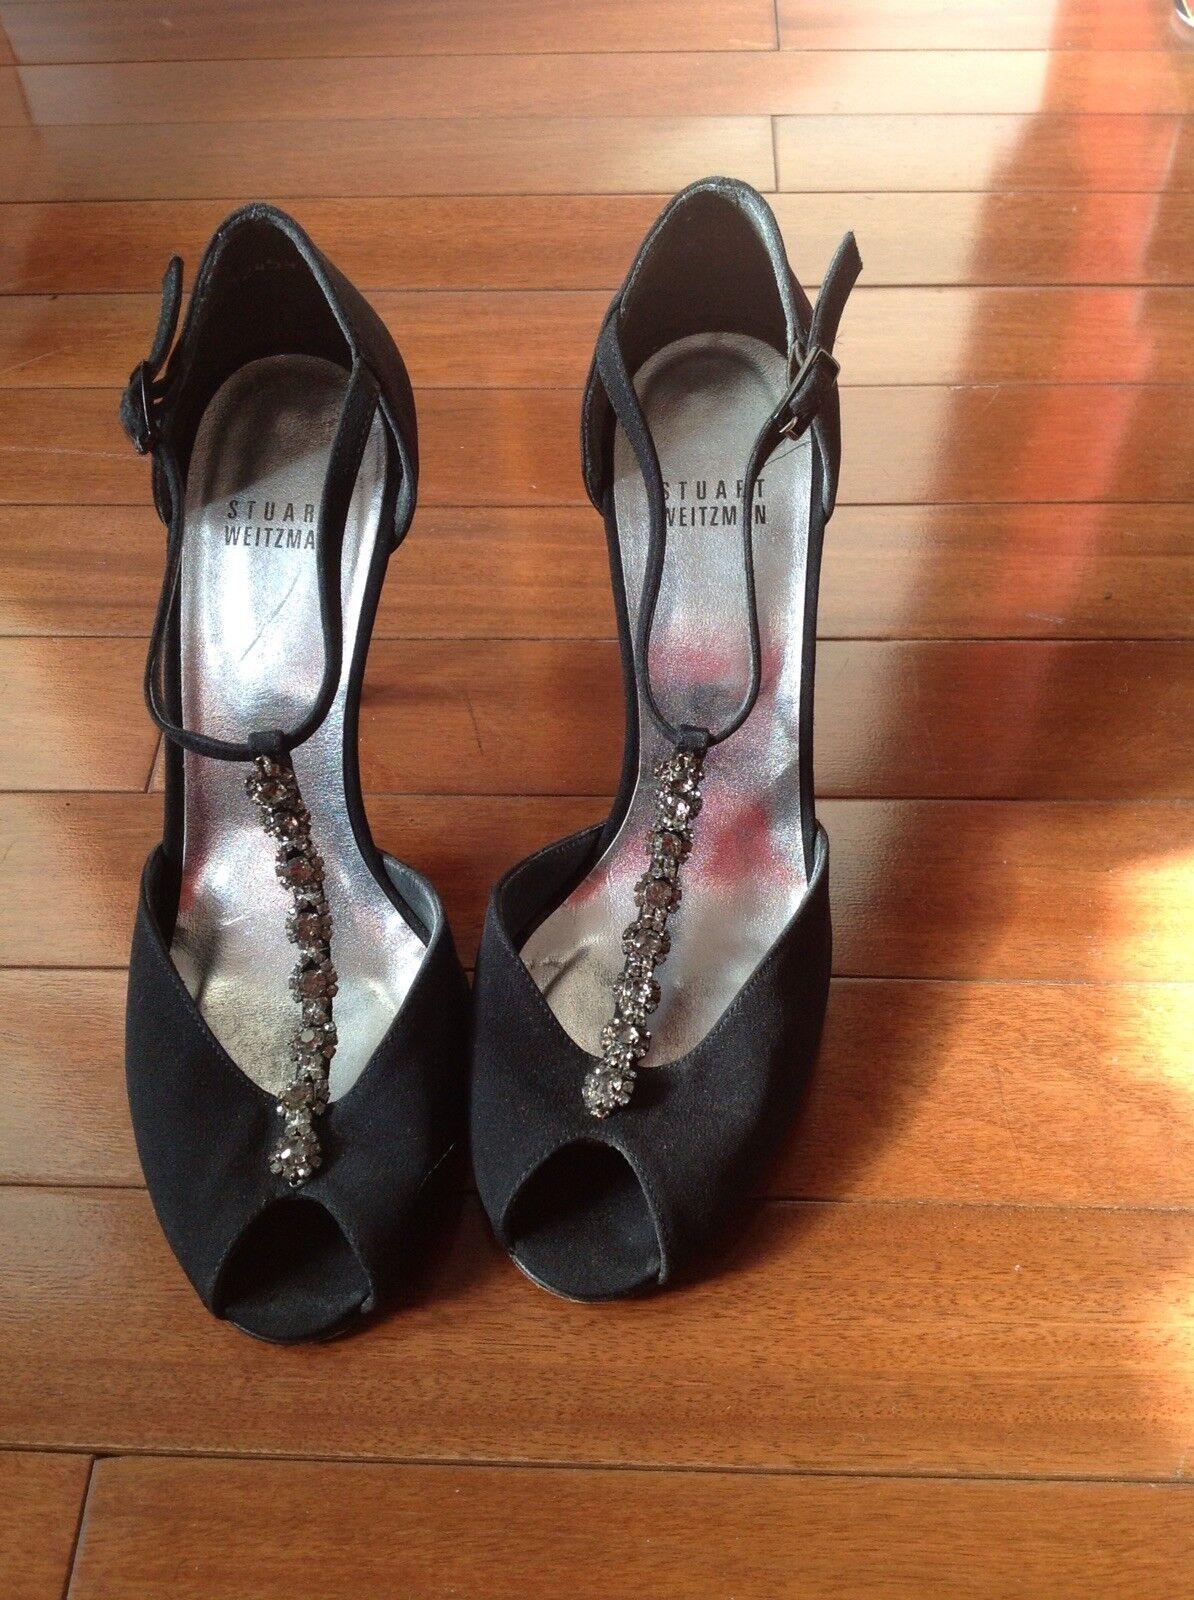 STUART WEITZMAN nero Satin Jeweled Designer EVENING Open Toe Pumps Prom scarpe 7